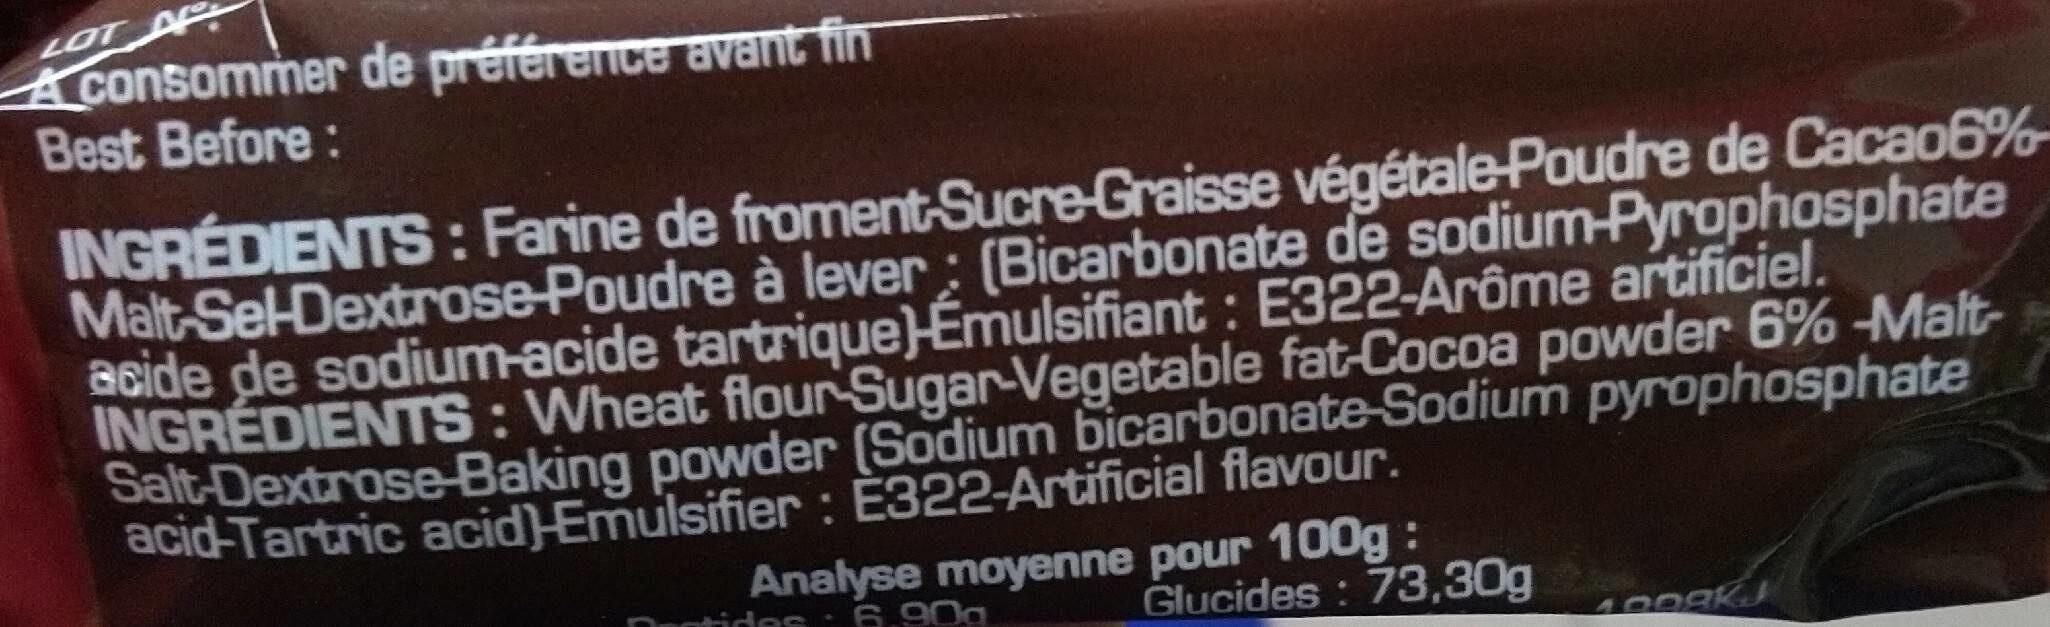 Super choco - Ingrediënten